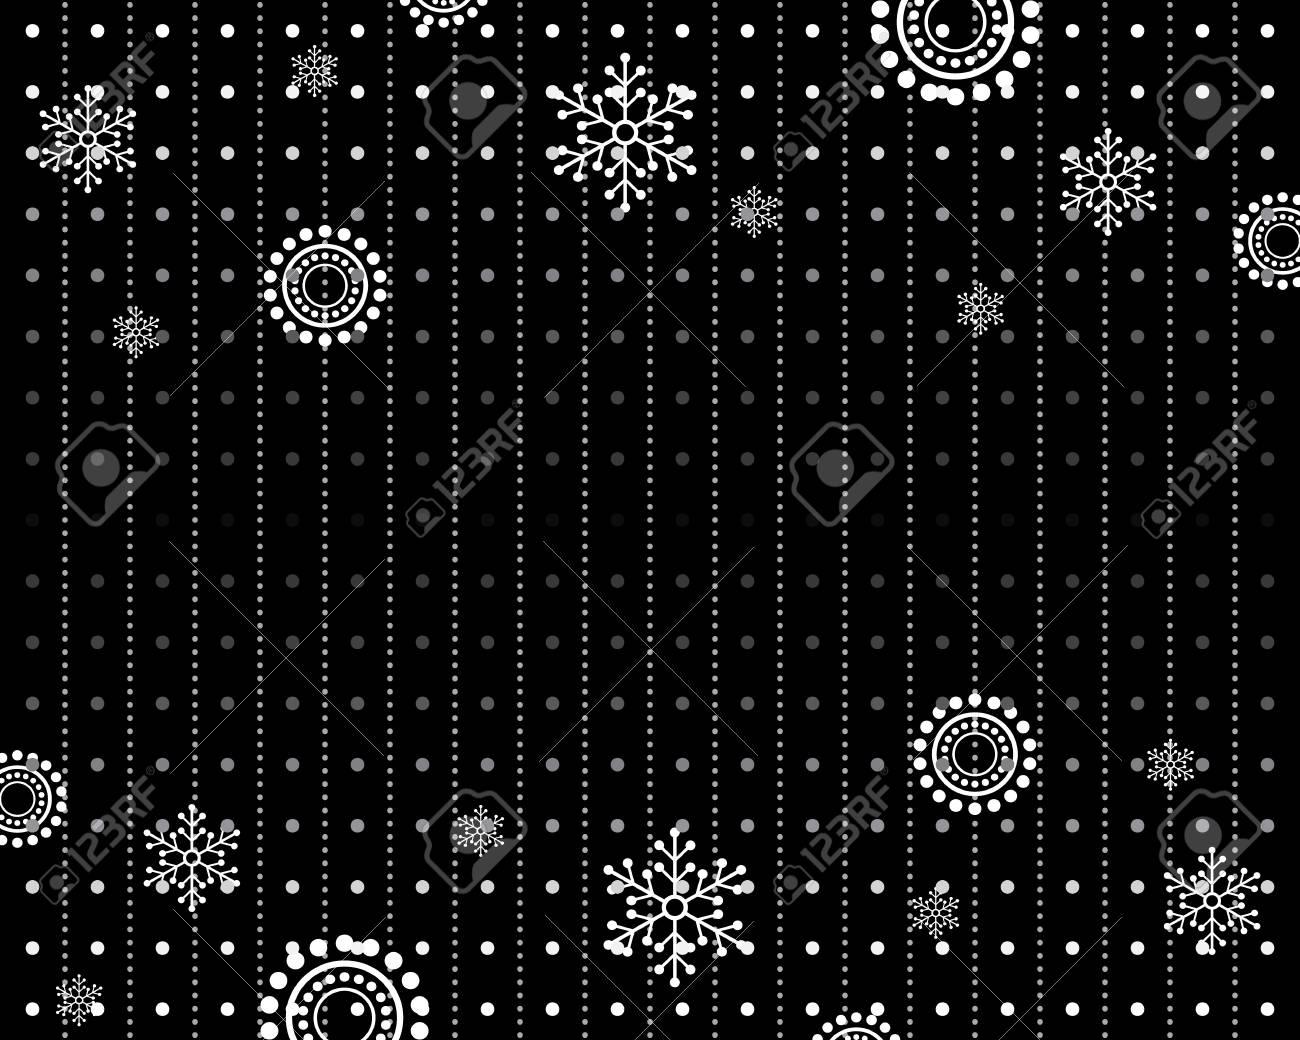 Winter pattern winter black and white background white snowflake winter pattern winter black and white background white snowflake 69465142 voltagebd Gallery